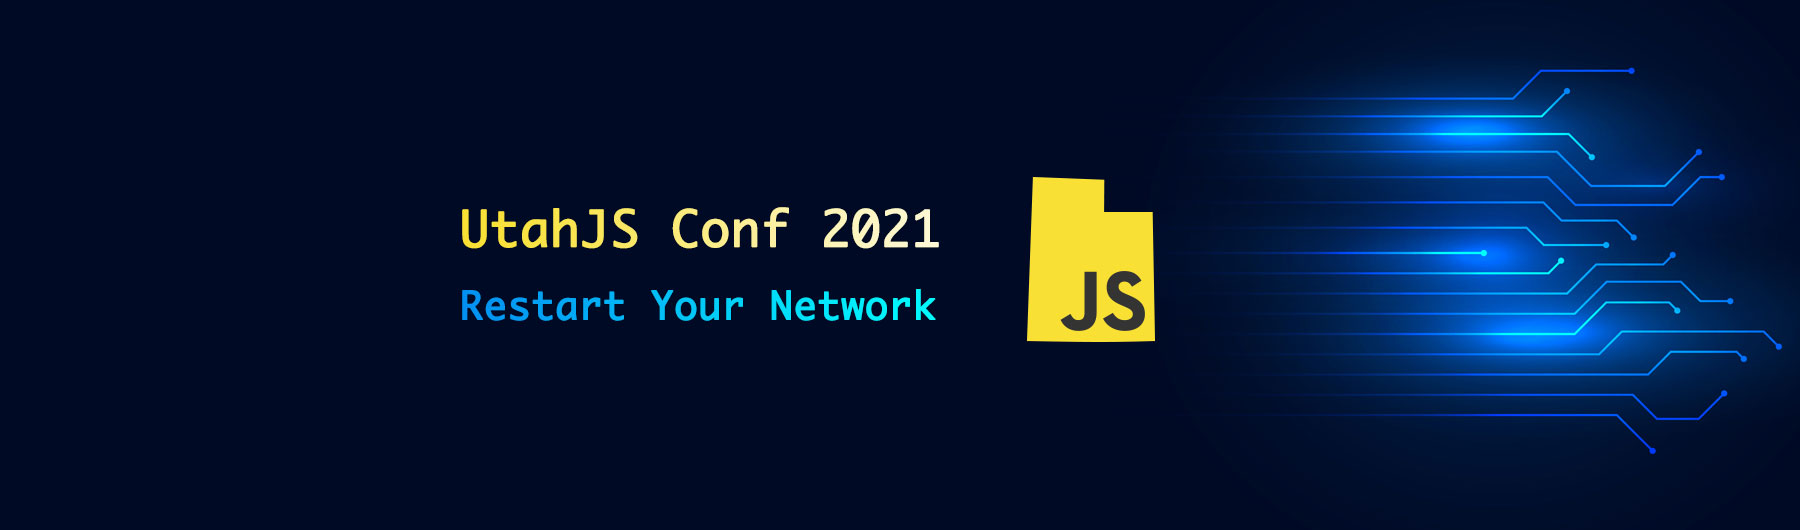 2021 UtahJS Conference